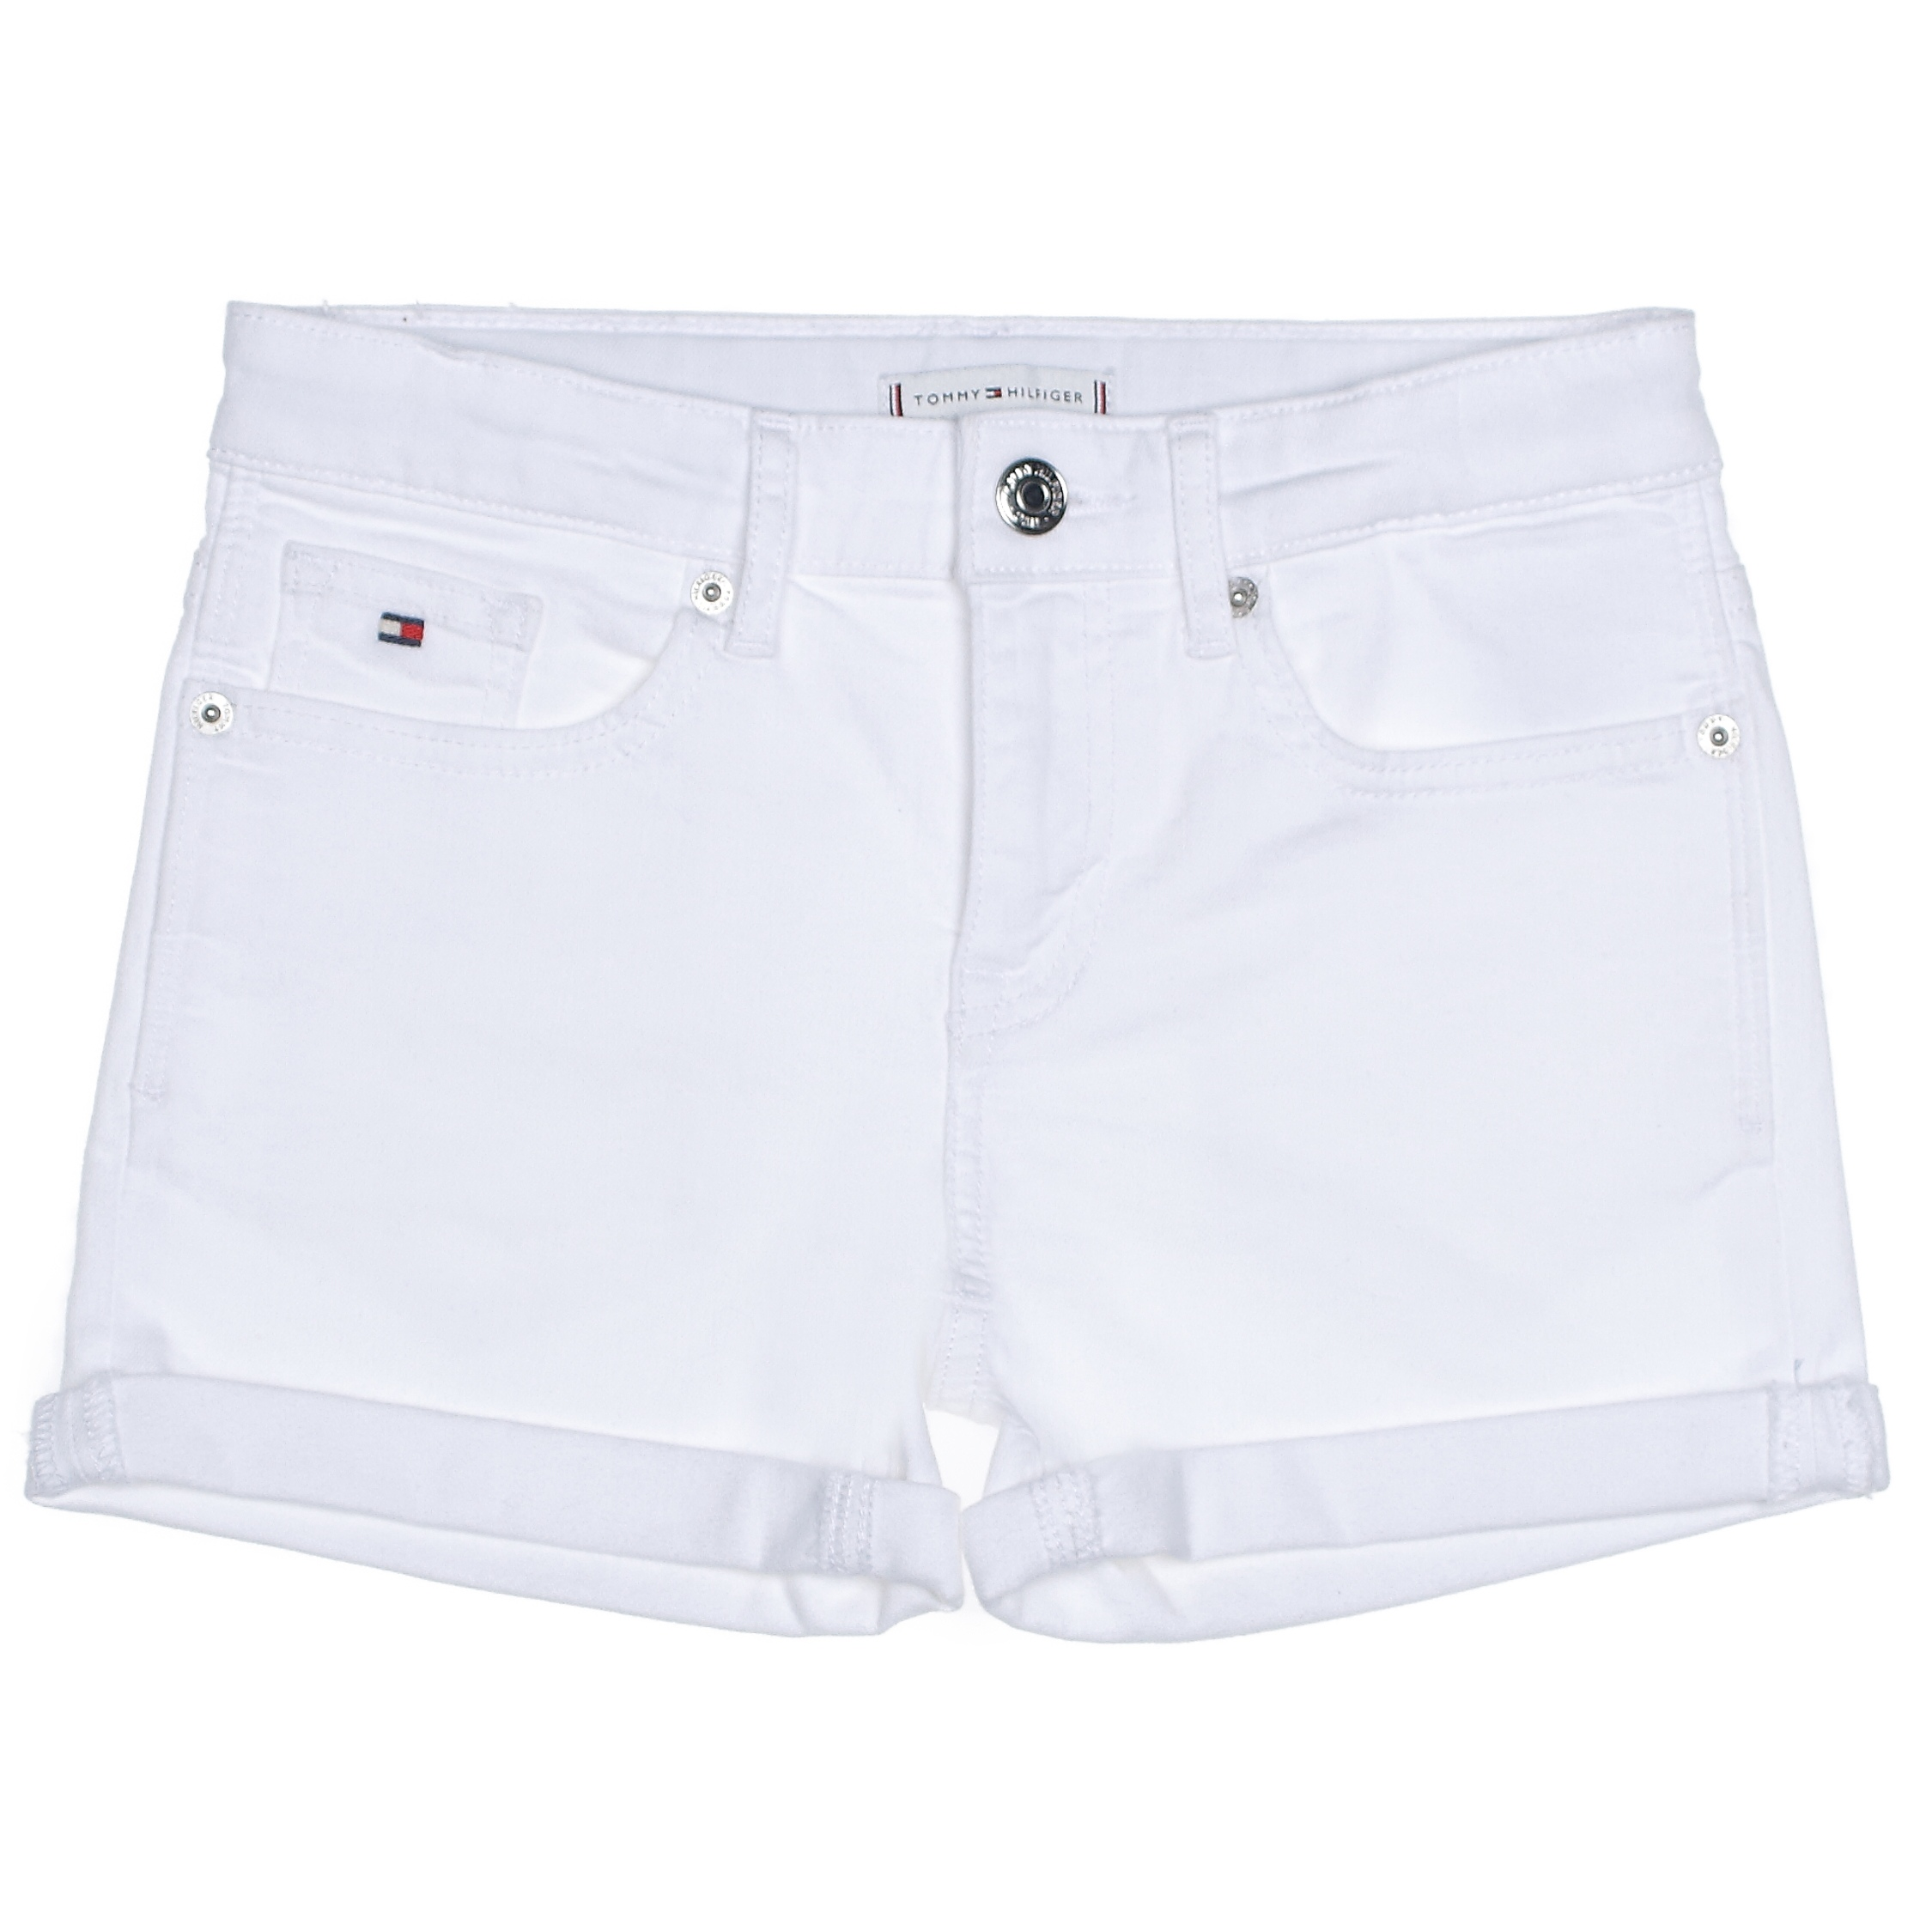 https://www.leadermode.com/190883/tommy-hilfiger-kg0kg04369-nora-short-123-bright-white.jpg